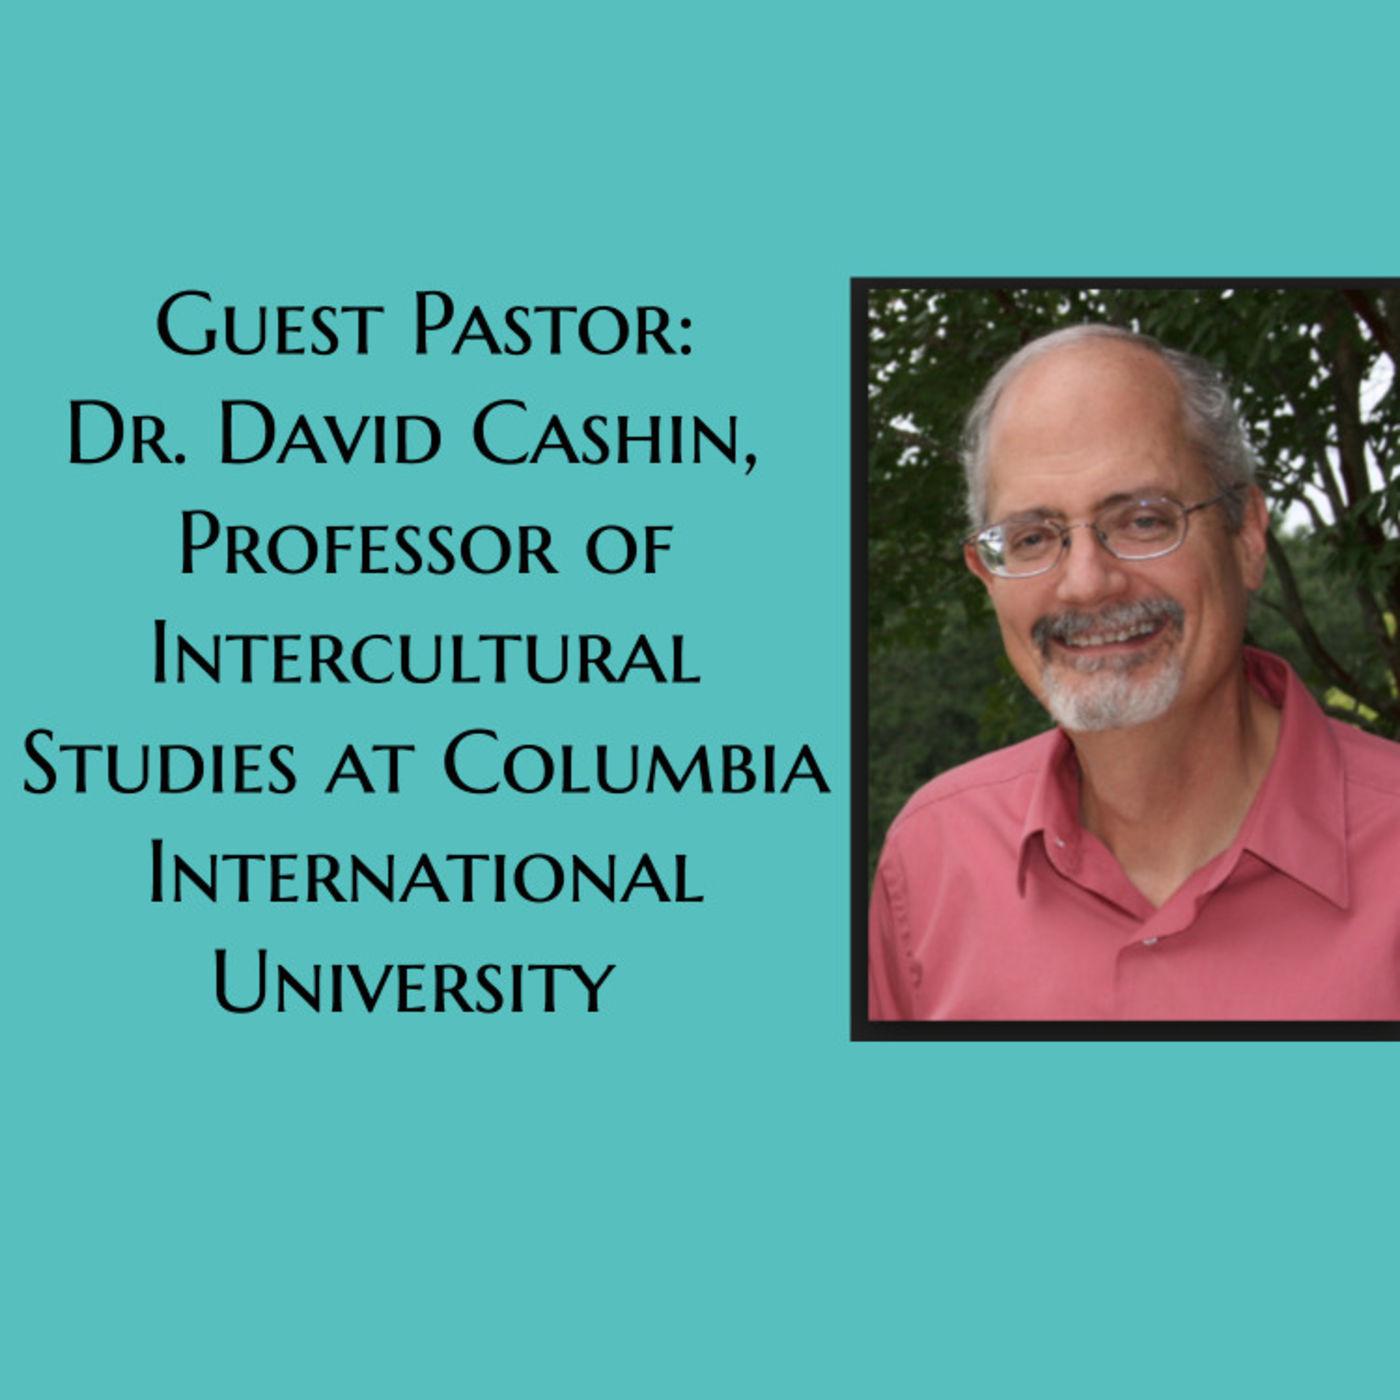 Guest Pastor: Dr. David Cashin, Galatians 4:21-31